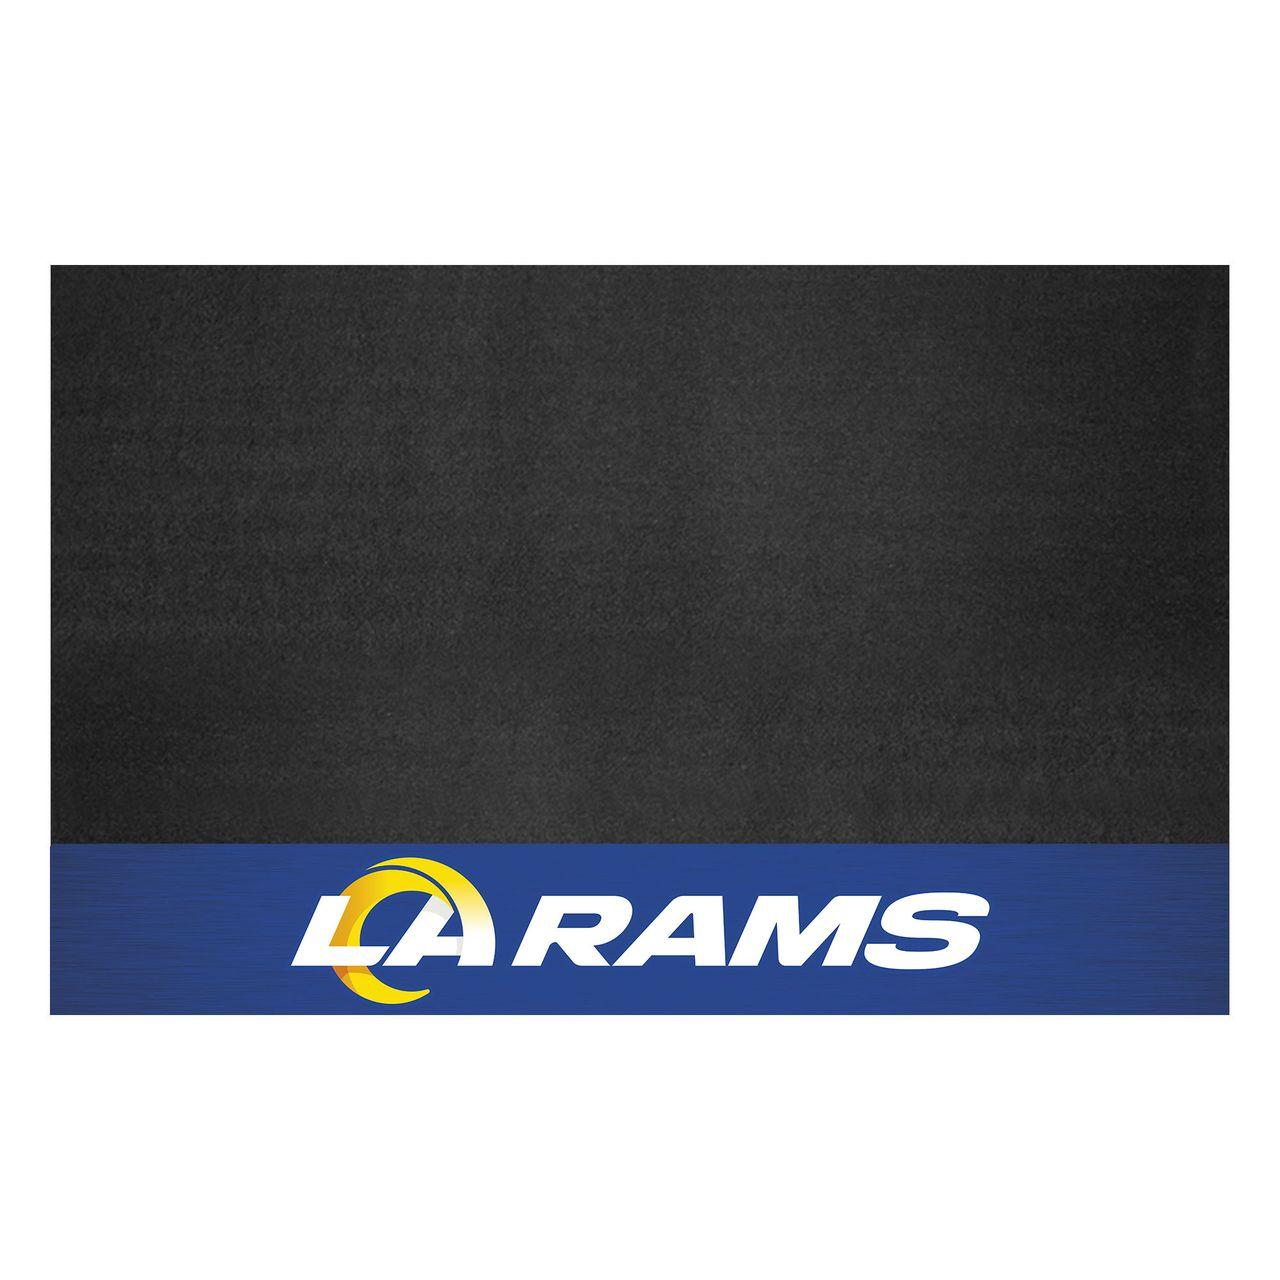 "Fanmats 12202 NFL - Los Angeles Rams Grill Mat 26""x42"""